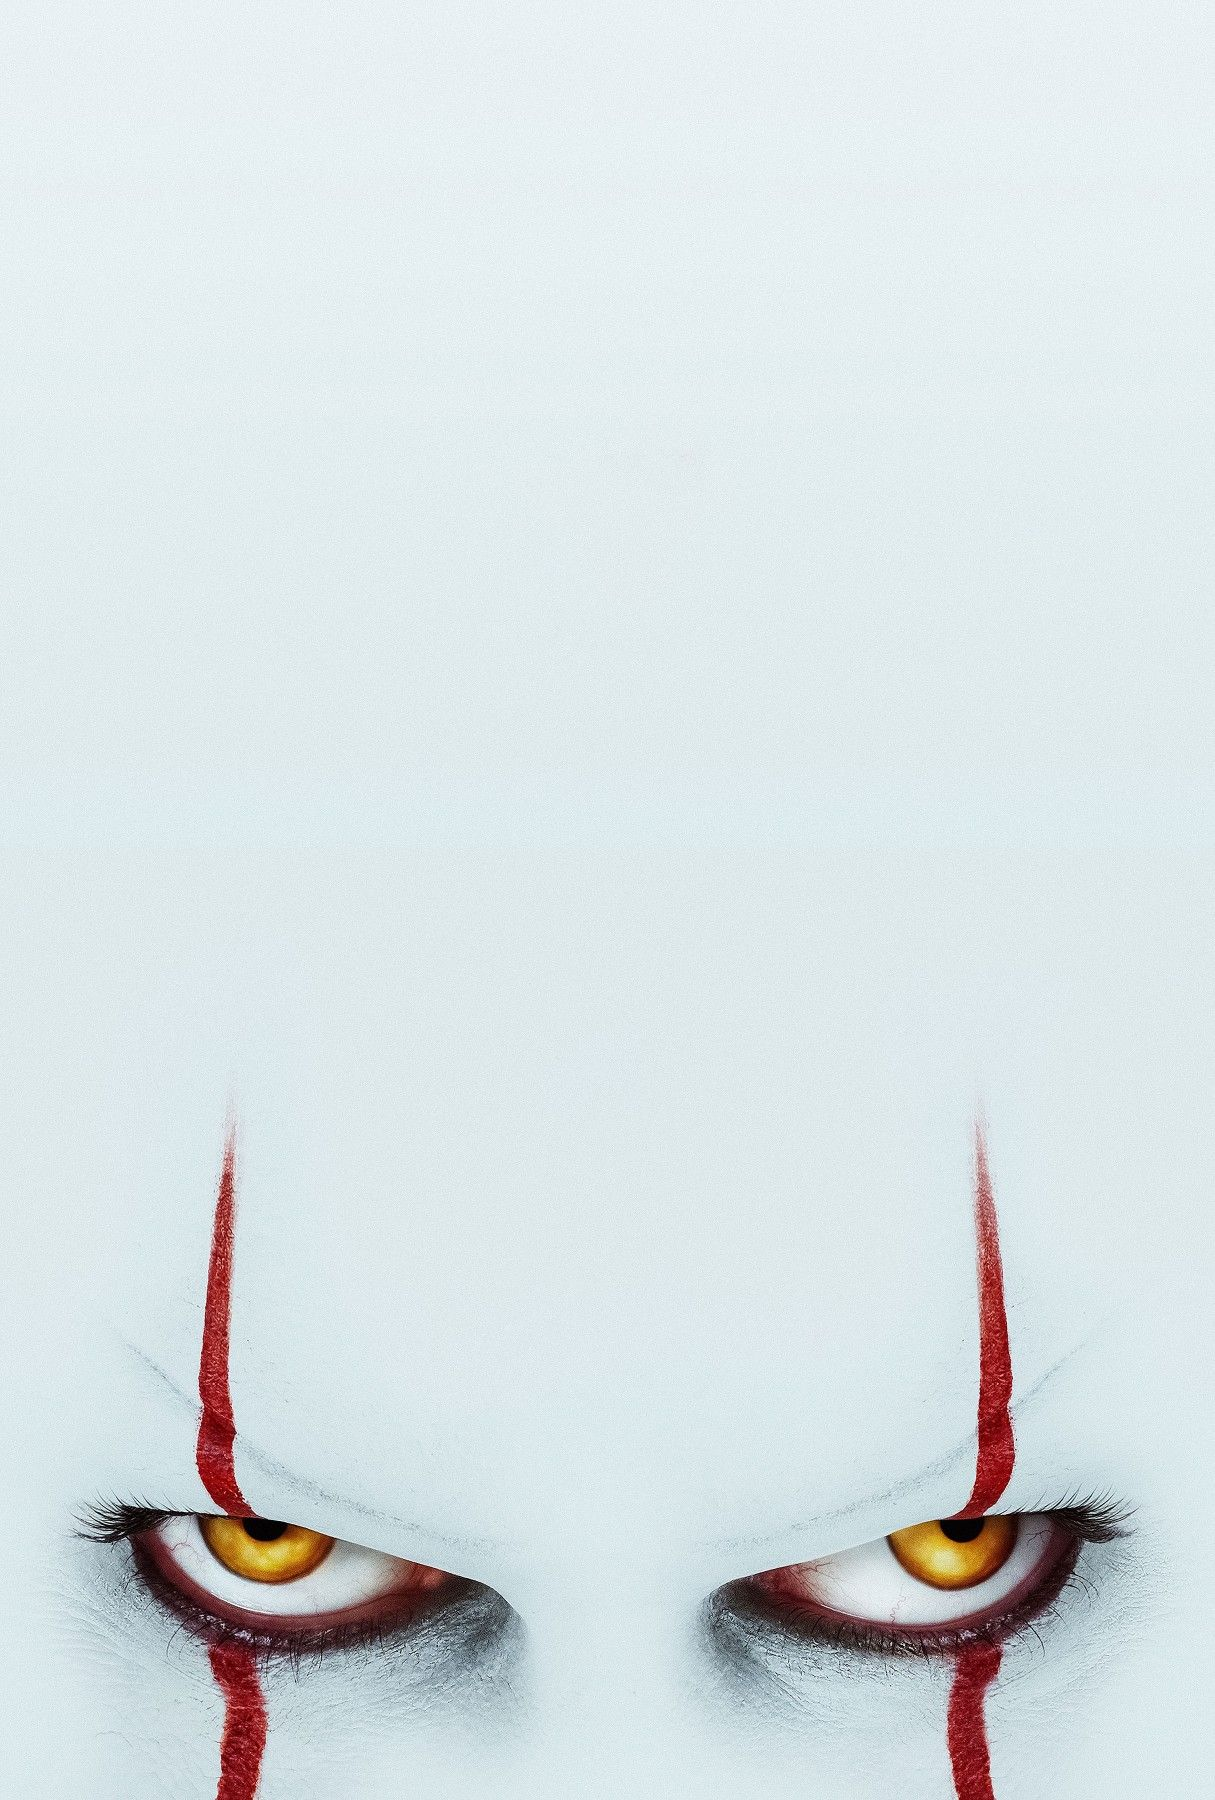 Pin by Eram Fathima on WALLPAPERS Wallpaper diy crafts